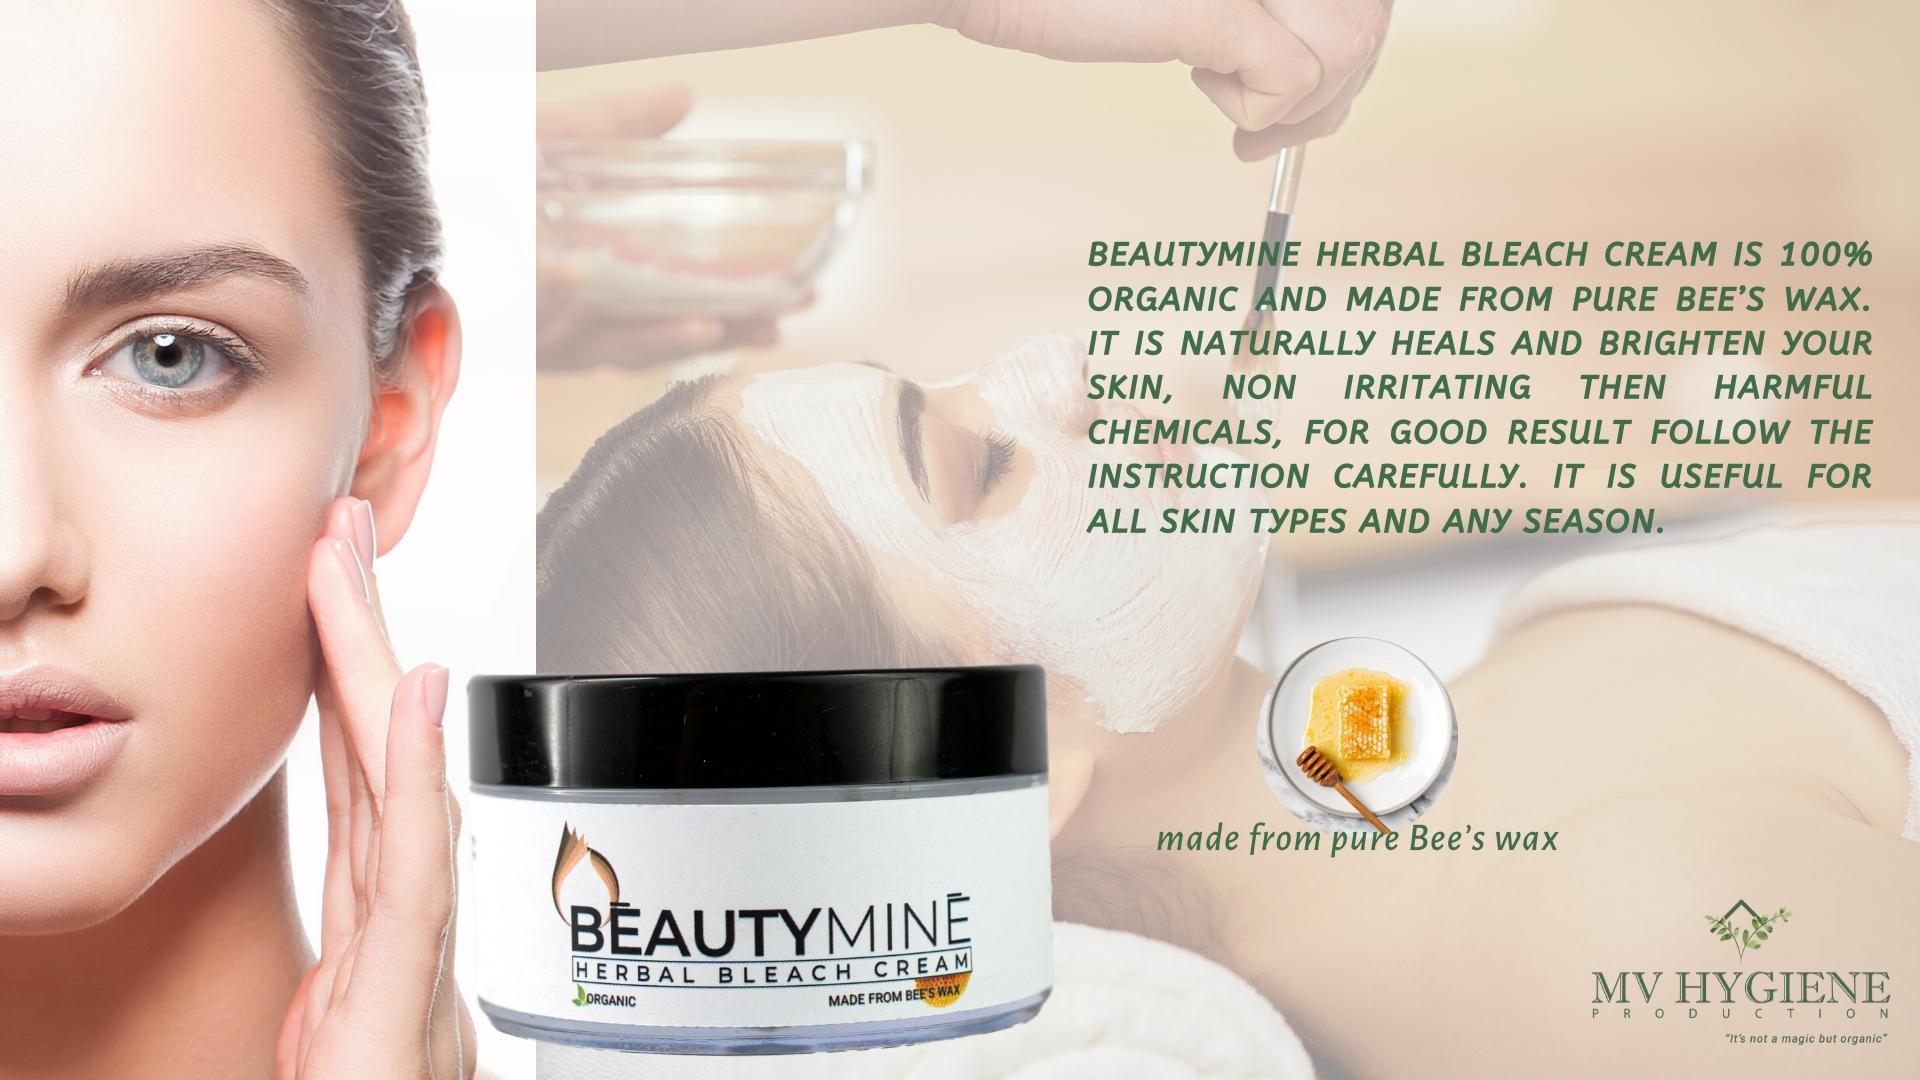 Beautymine Herbal Bleach Cream